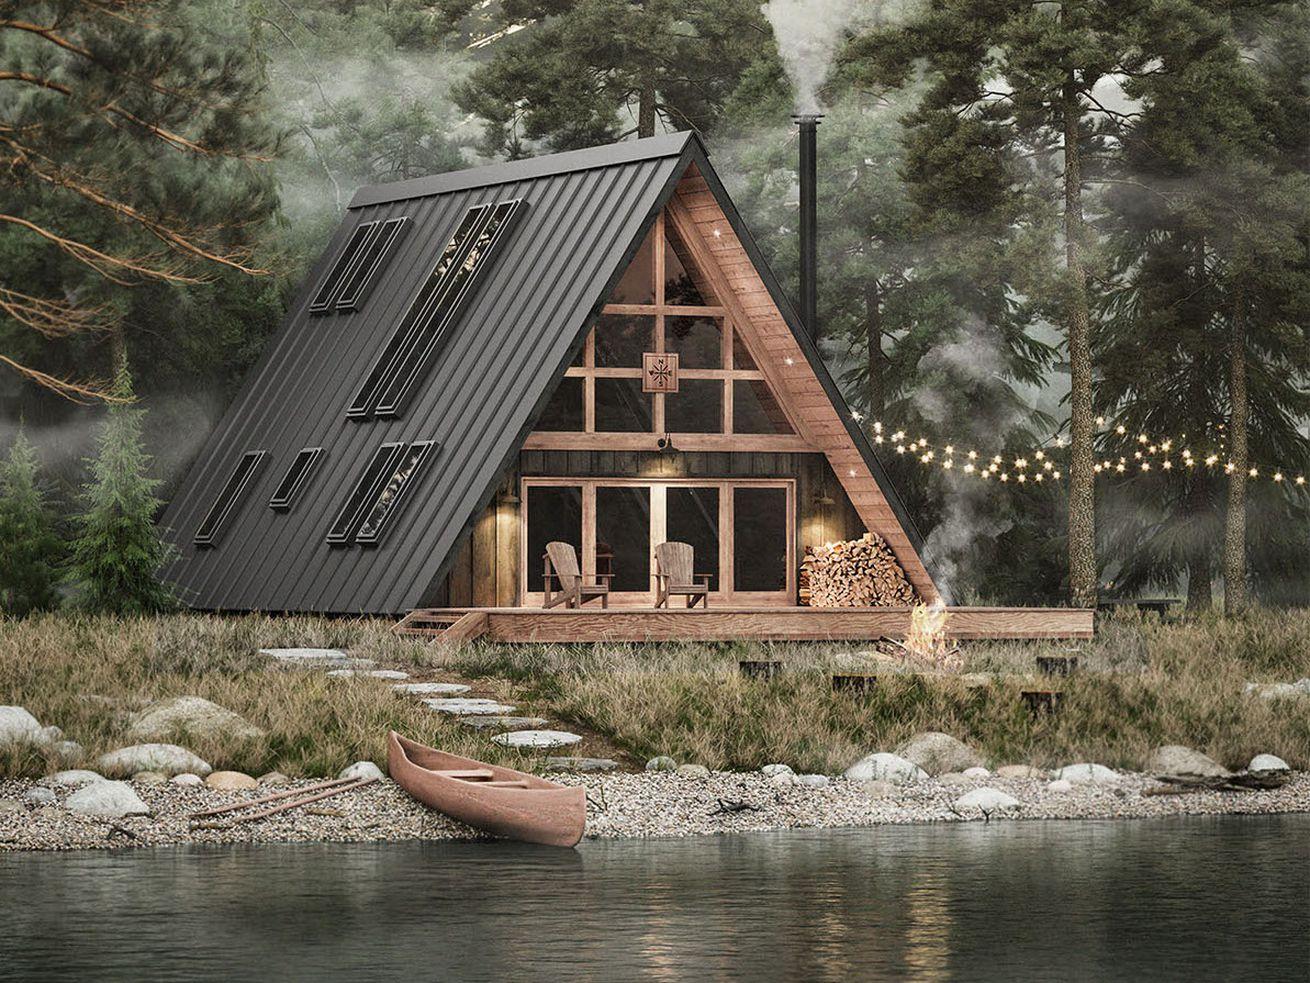 DIY a modern A-frame house with $2K blueprints